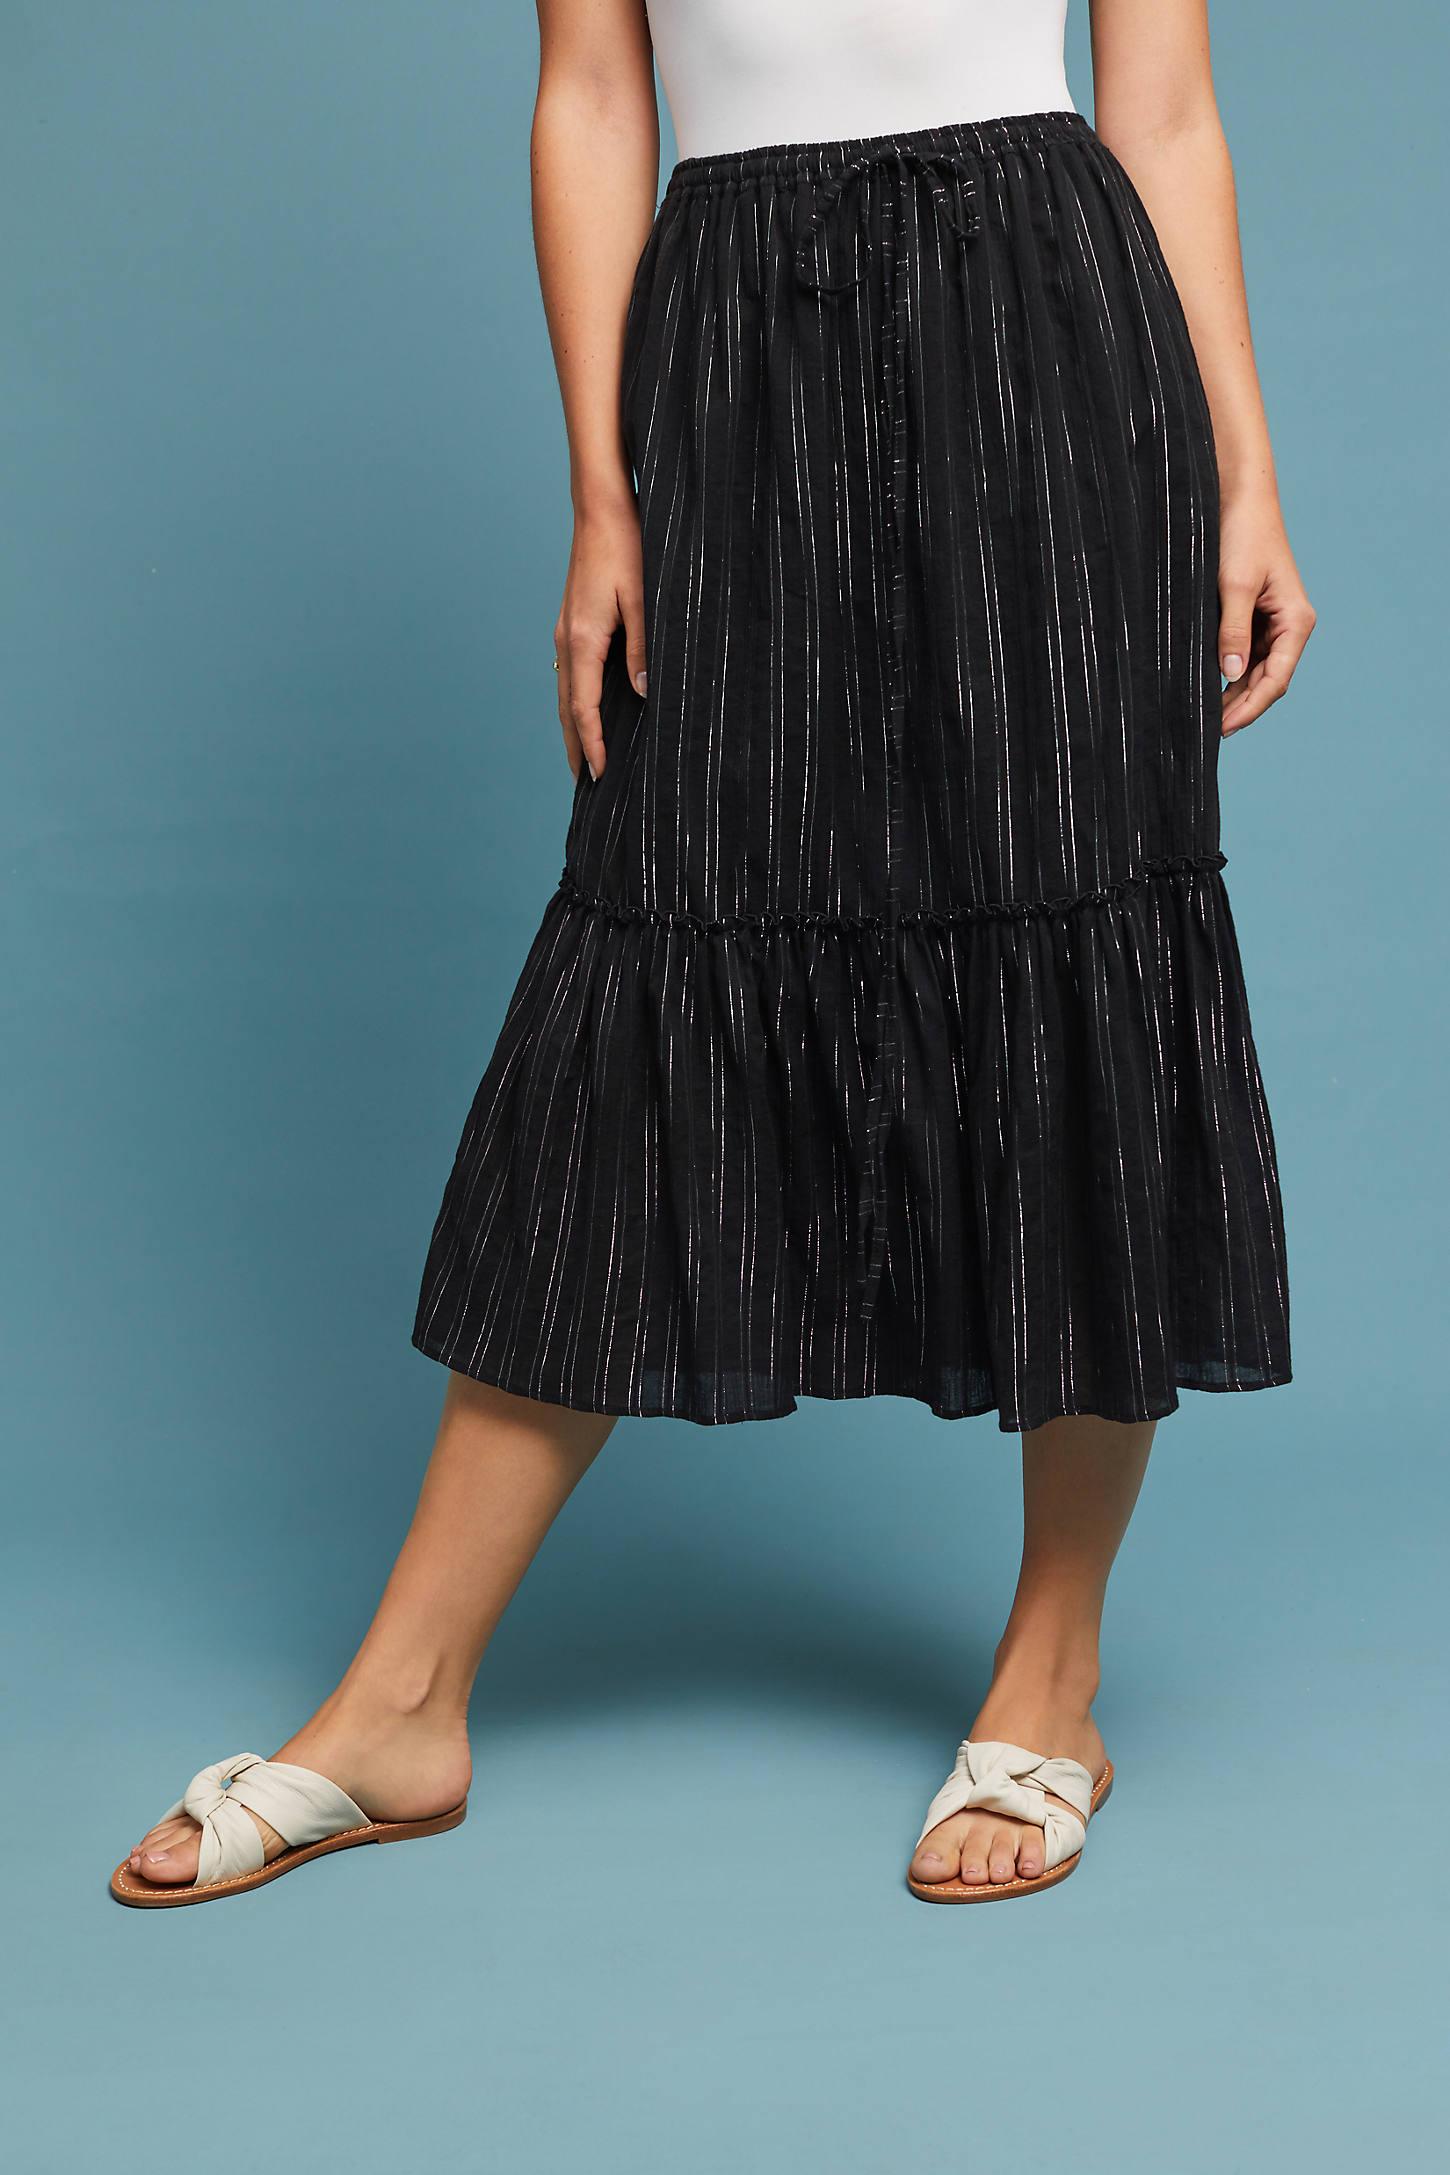 Moonlight Skirt